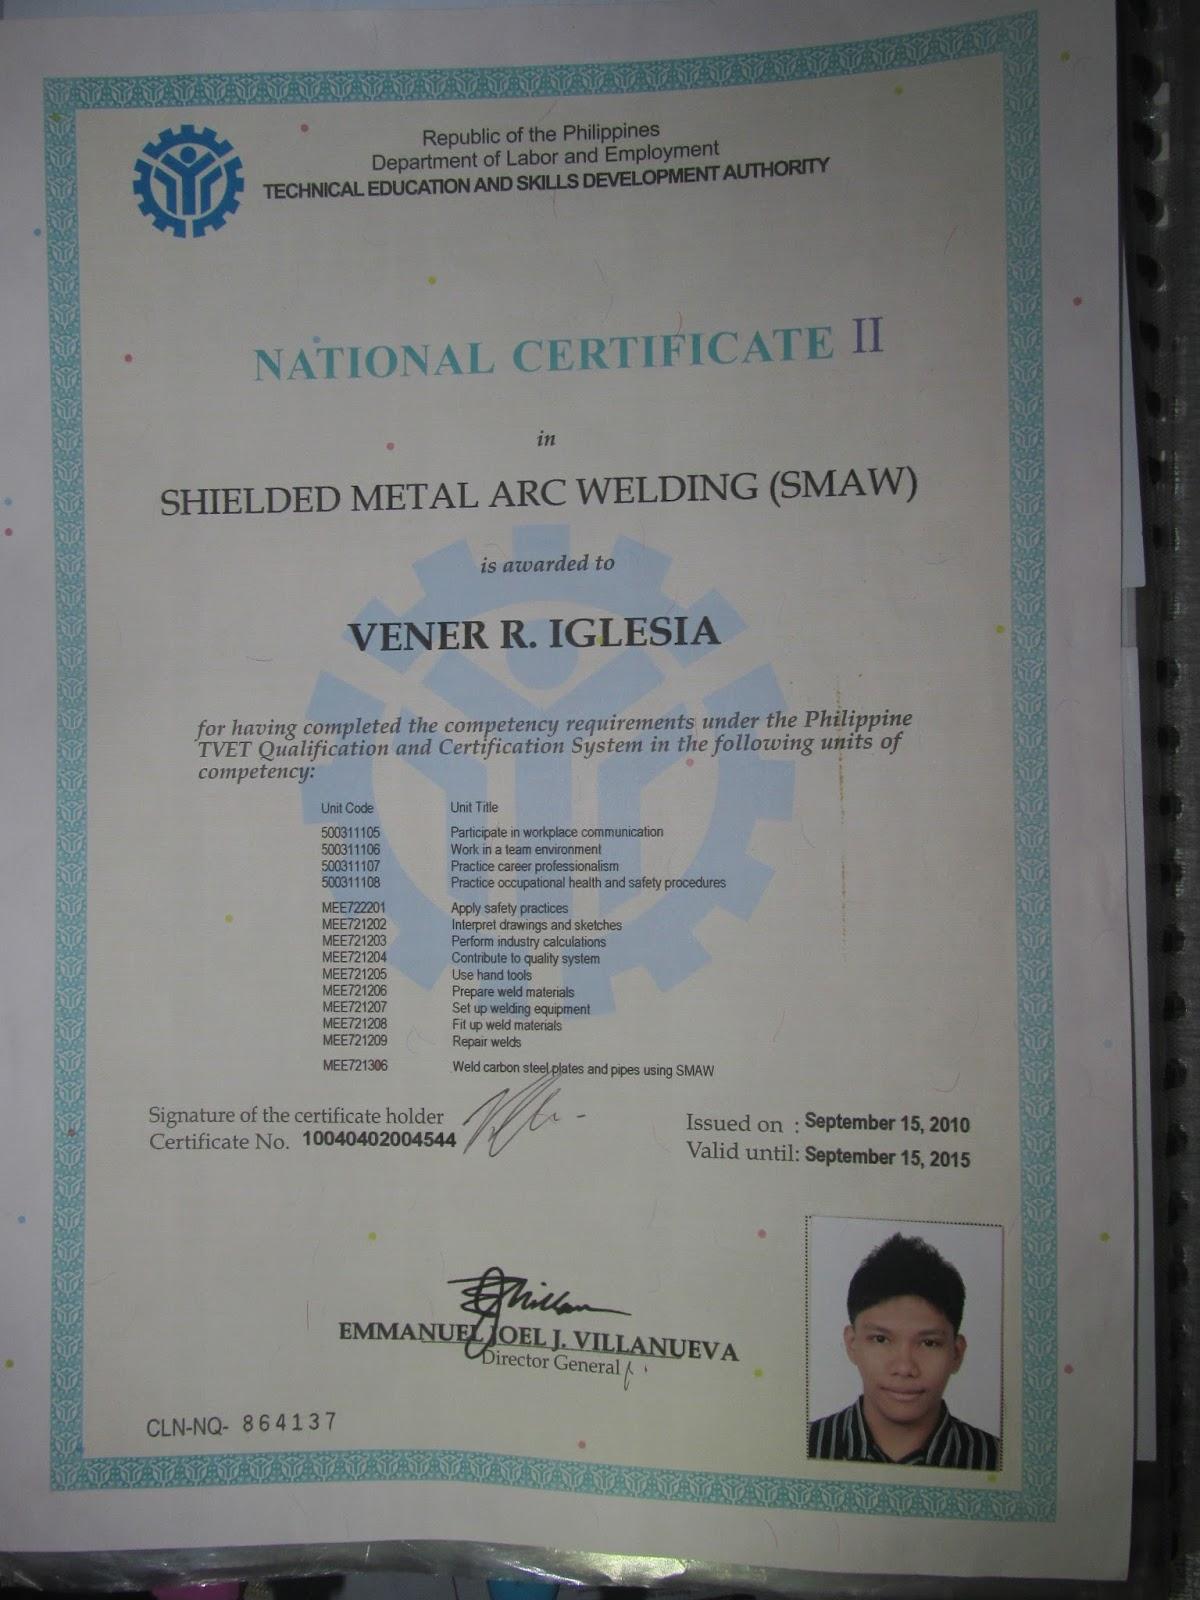 Vener del rosario iglesia ojt certificate of participationseminar yadclub Choice Image